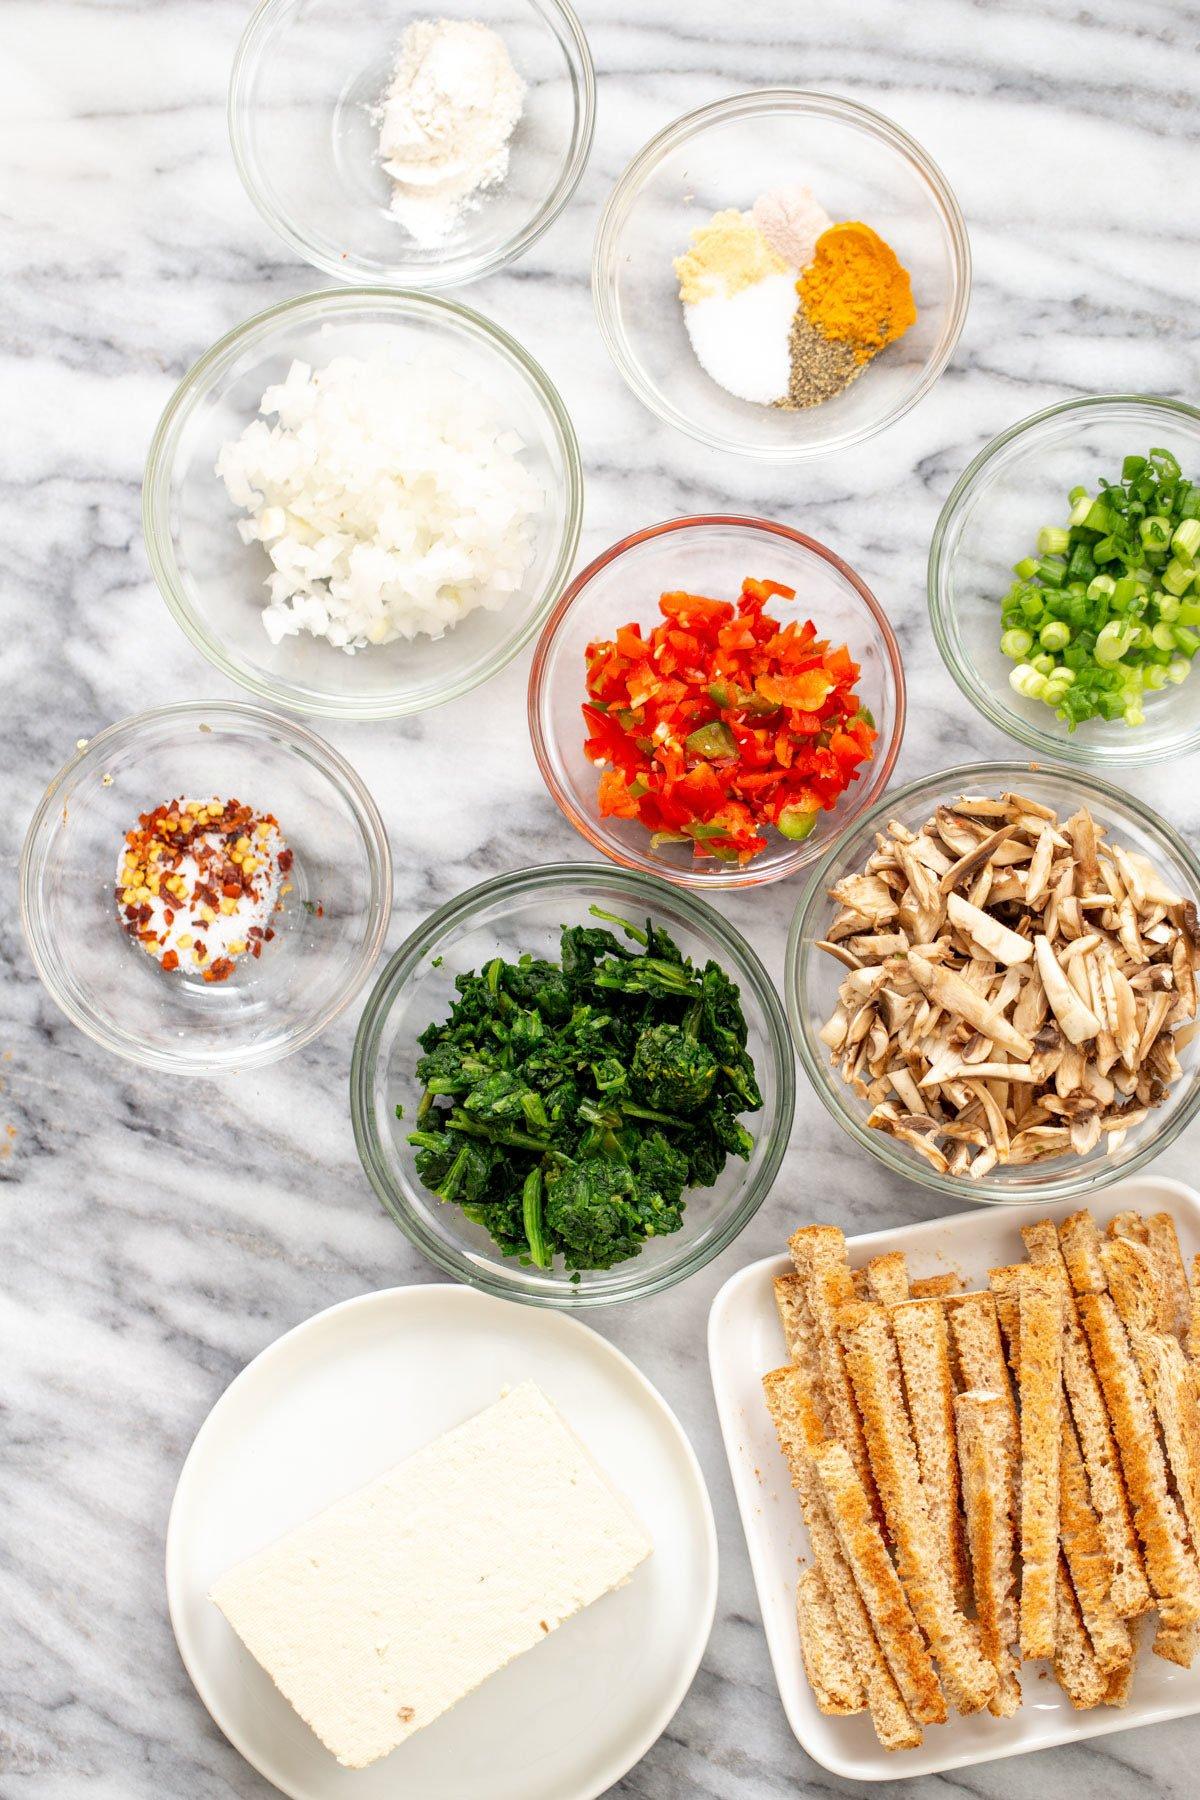 ingredients for making vegan egg casserole